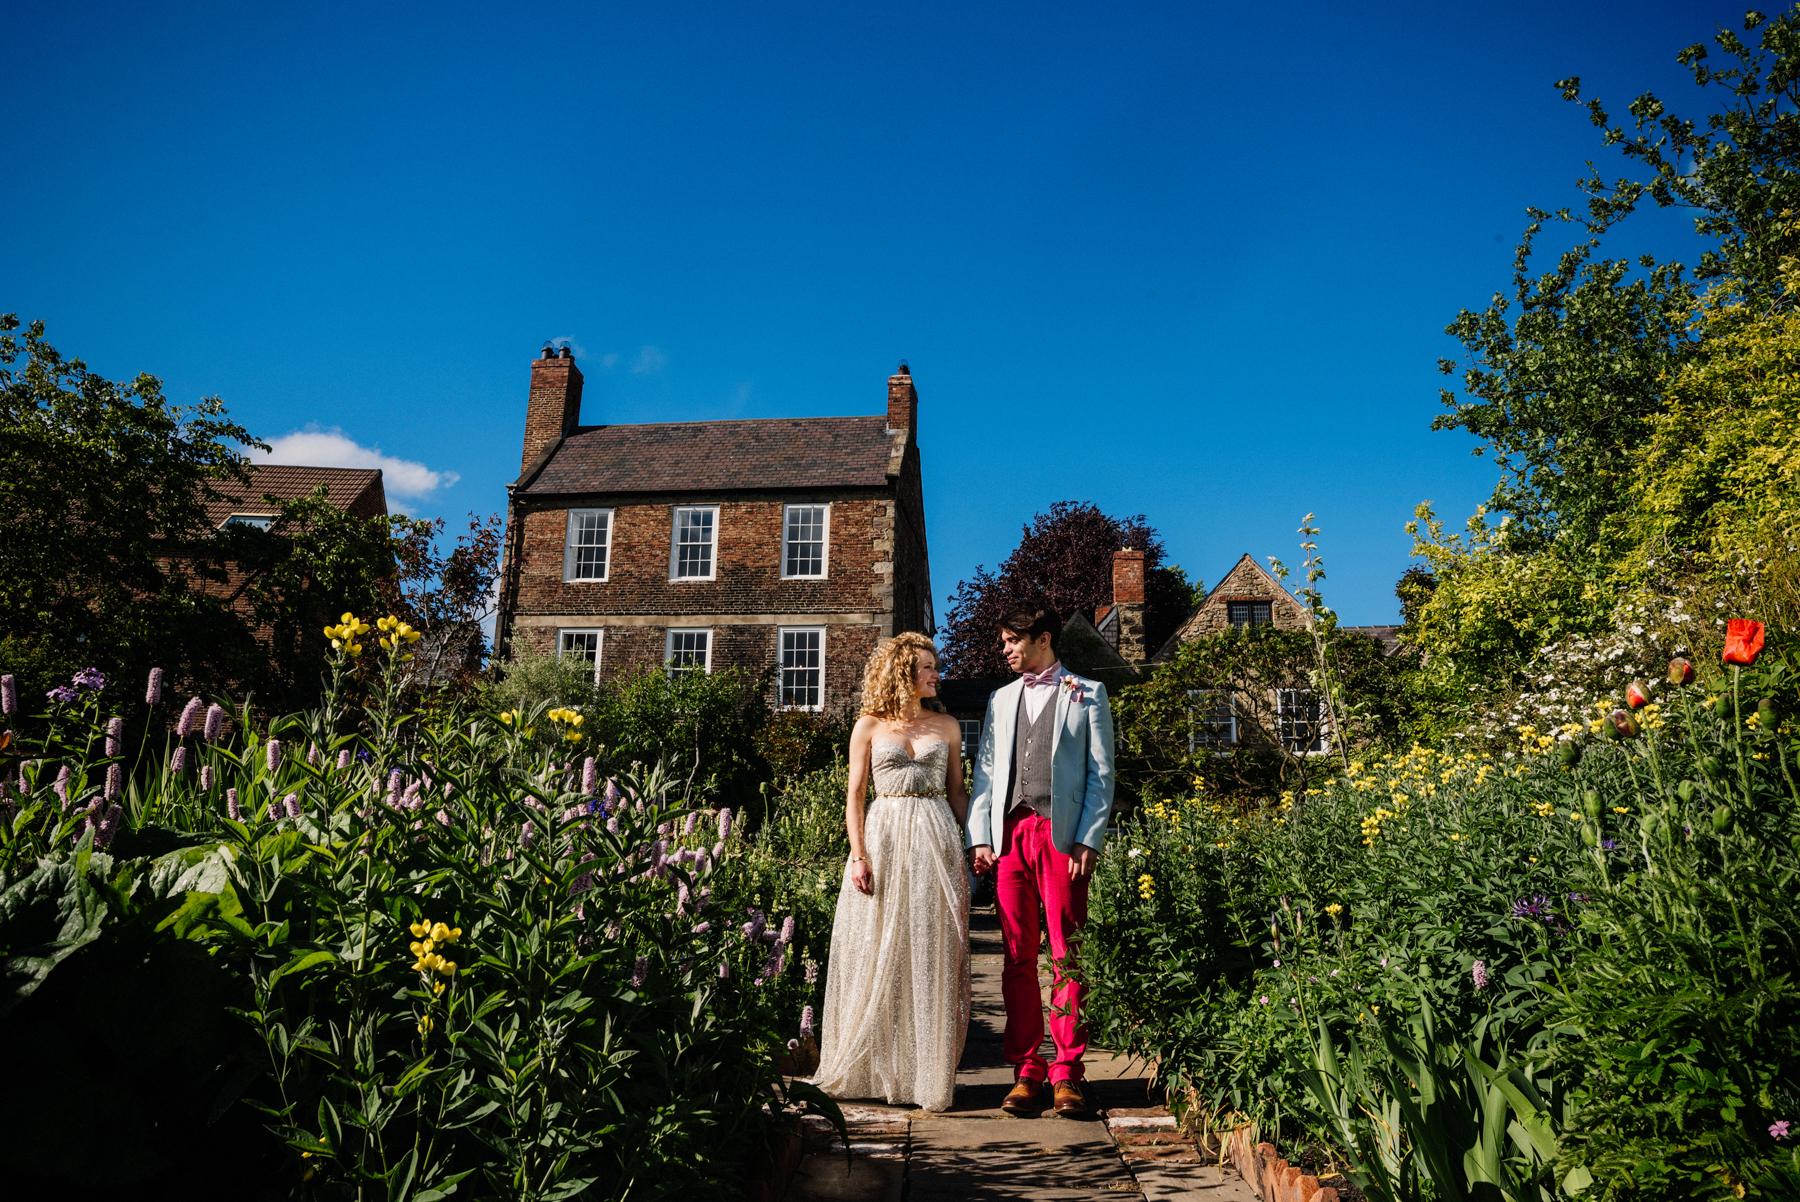 Sarah Seven bride with groom